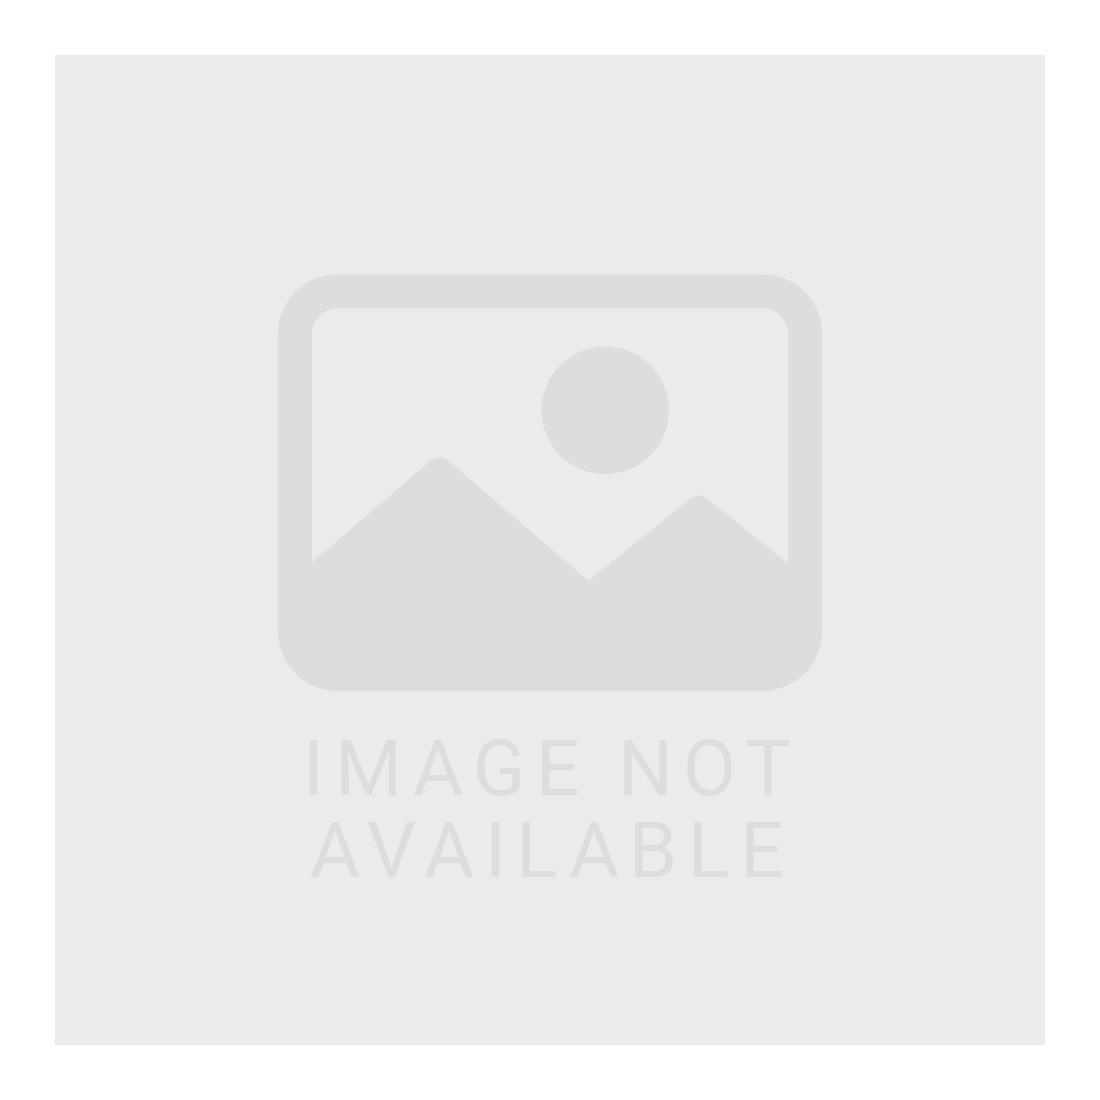 Vintage Power Wagon T-shirt